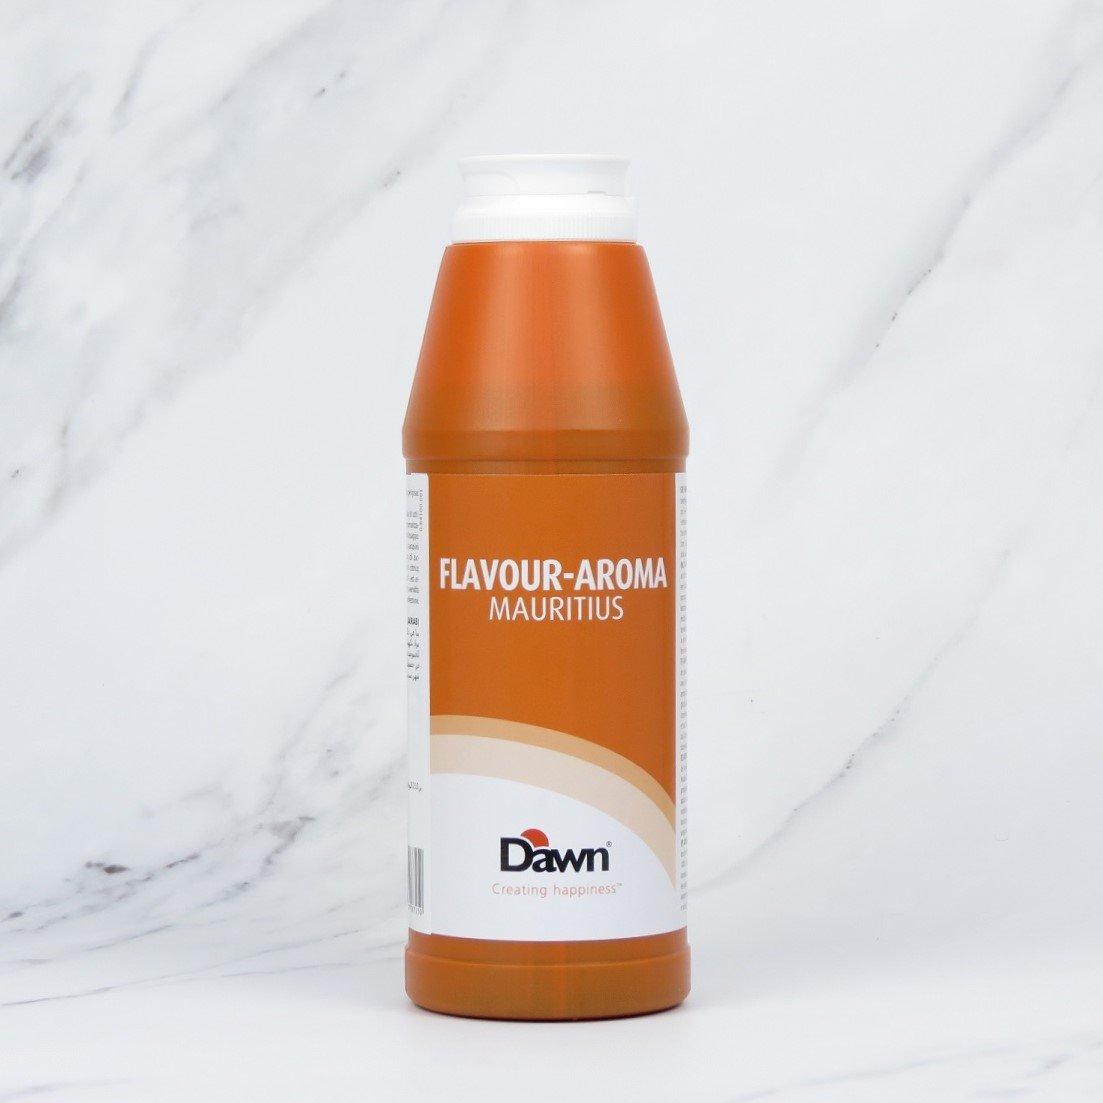 Dawn Flavour-Aroma Mauritius – 1lt